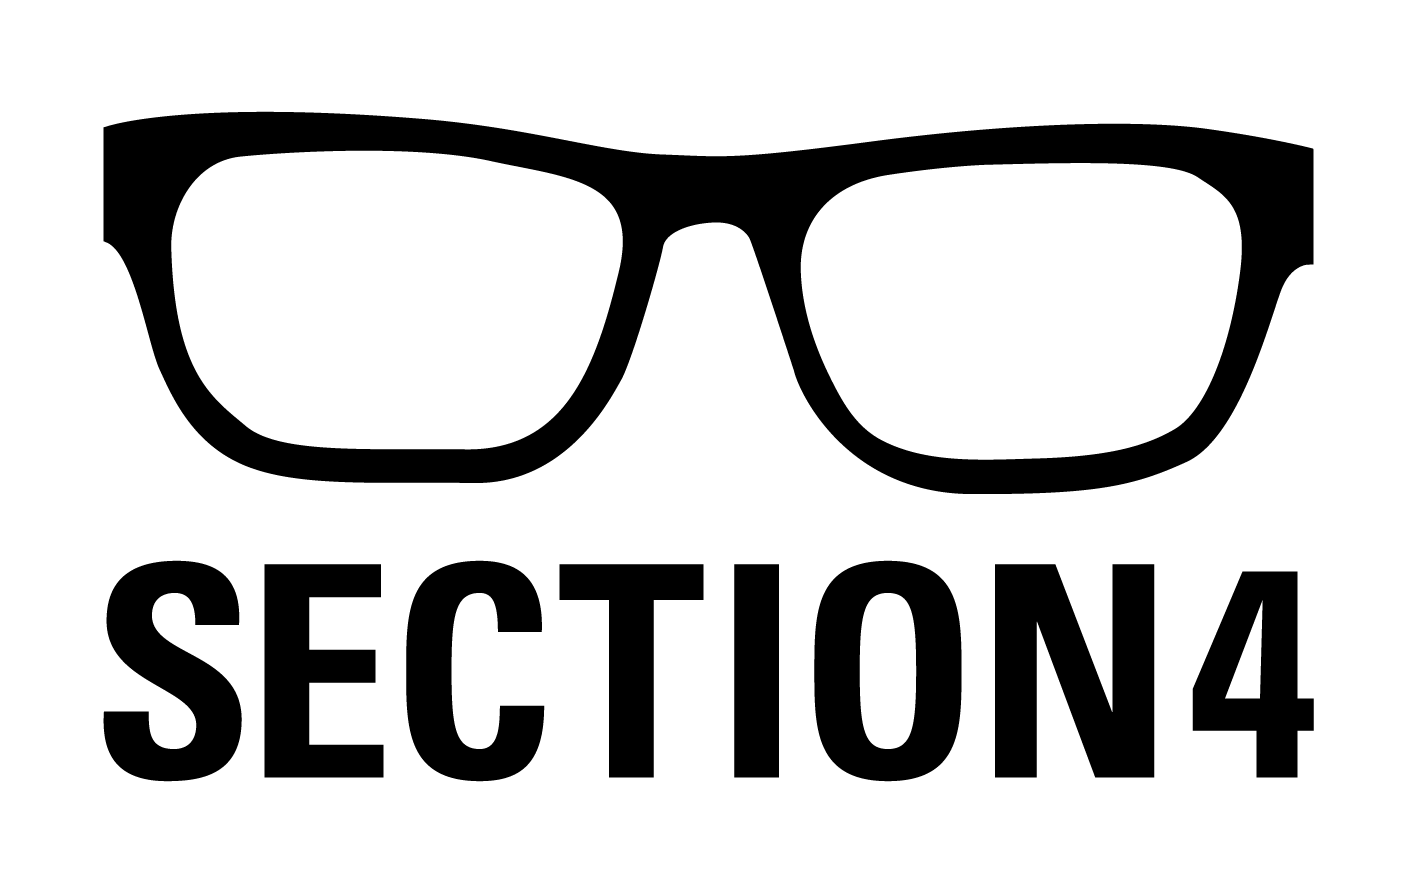 Section4 logo